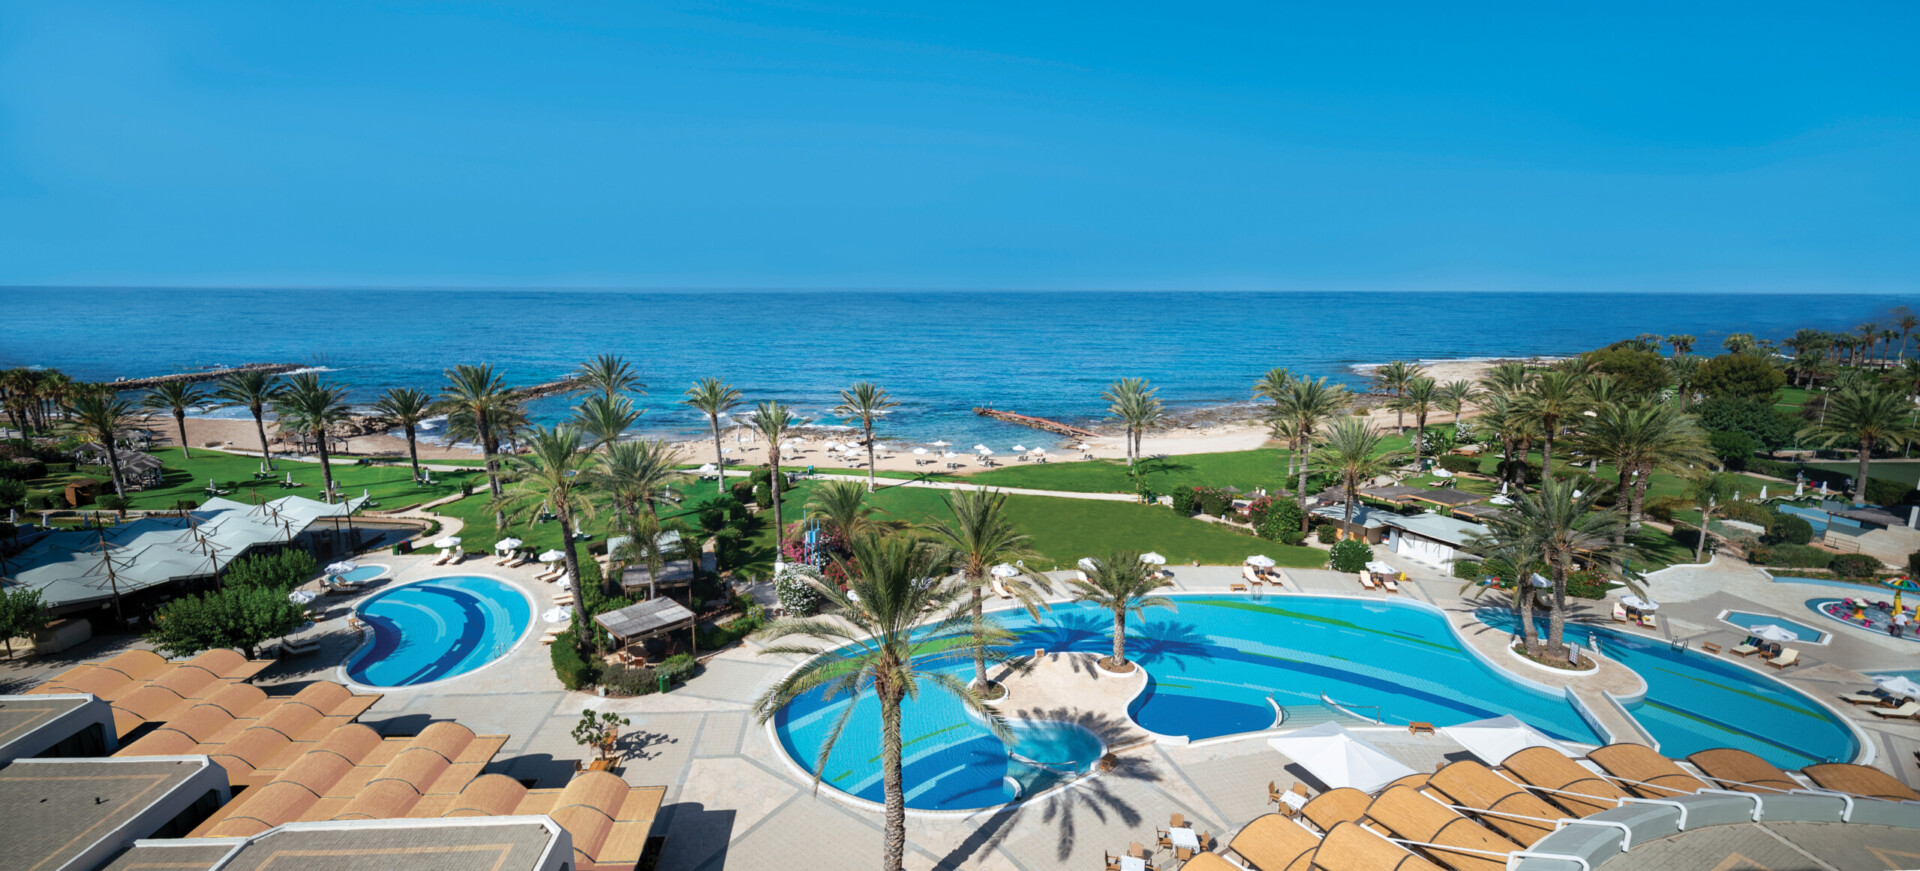 5 ATHENA BEACH HOTEL POOL AND SEA VIEW